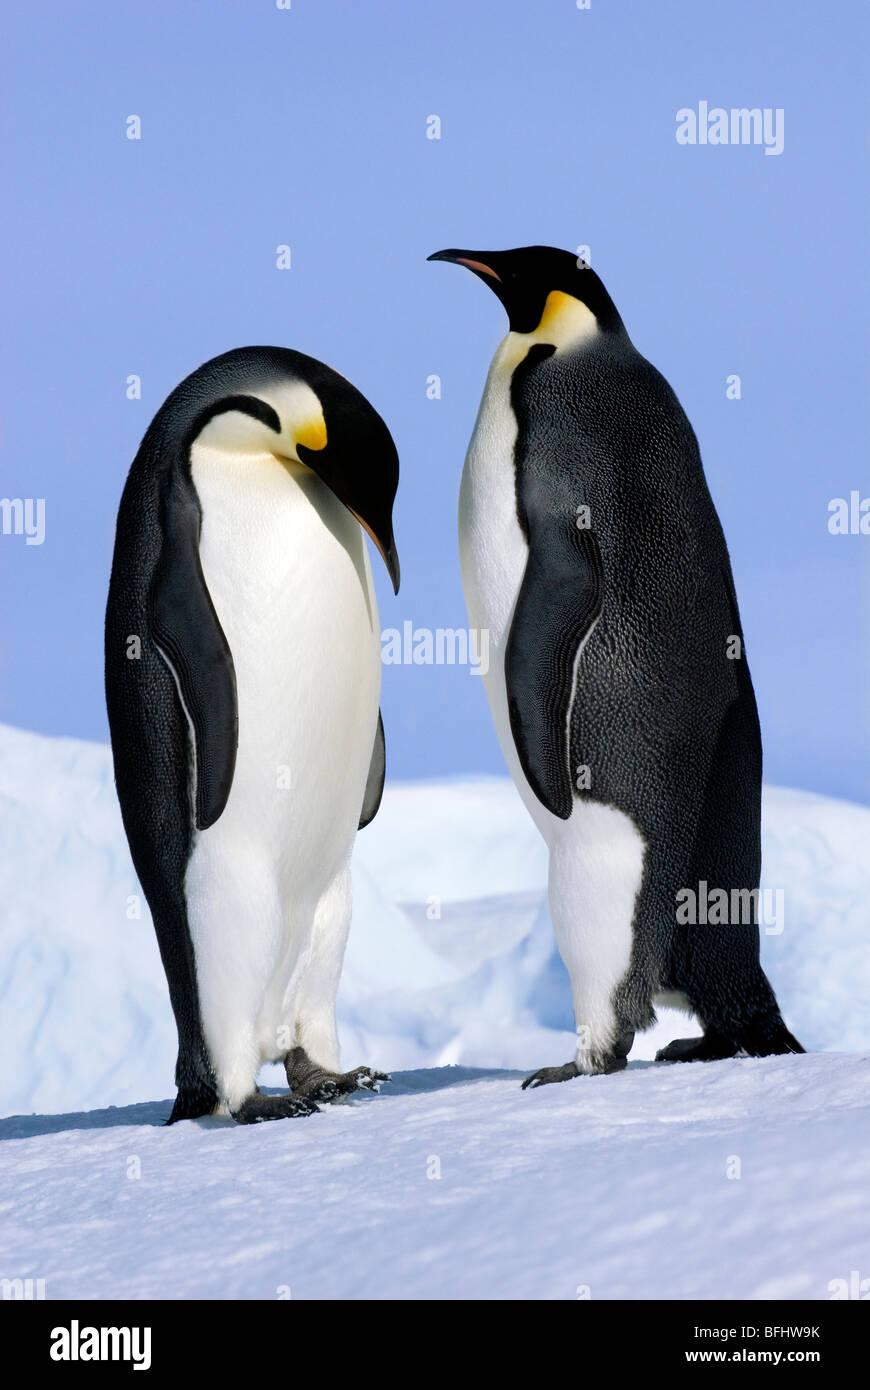 Courting emperor penguins (Aptenodytes forsteri), Snow Hill Island, Weddell Sea, Antarctica - Stock Image